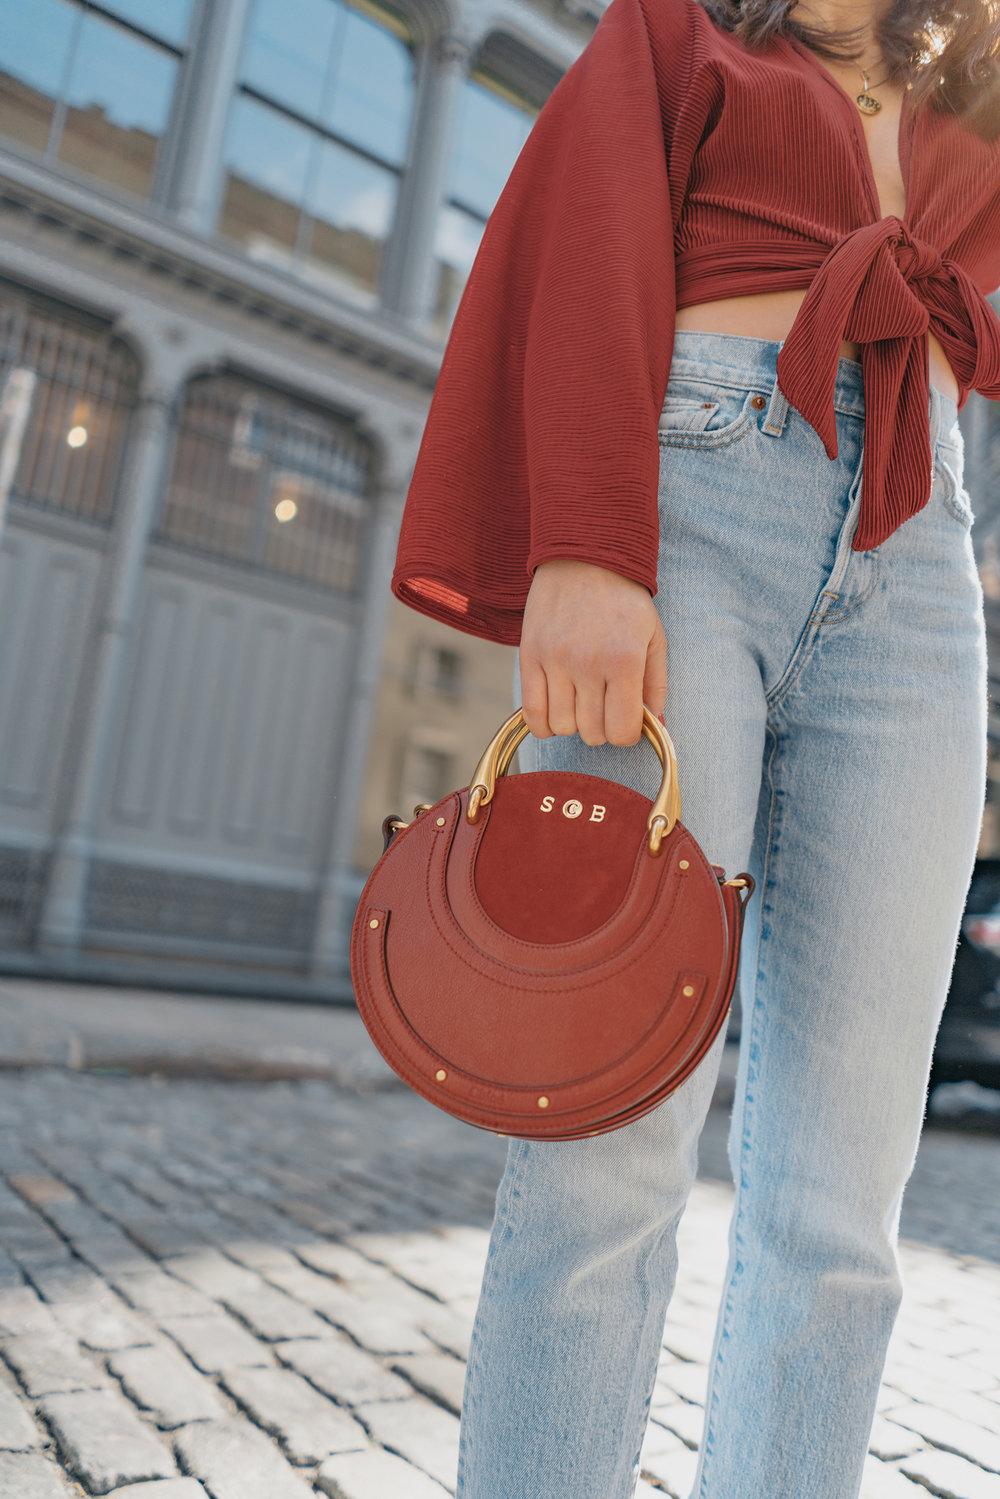 Red-Kimono-Tie-Front-Top-Ruby-Chloe-Pixie-Leather-Crossbody-Bag-5.jpg